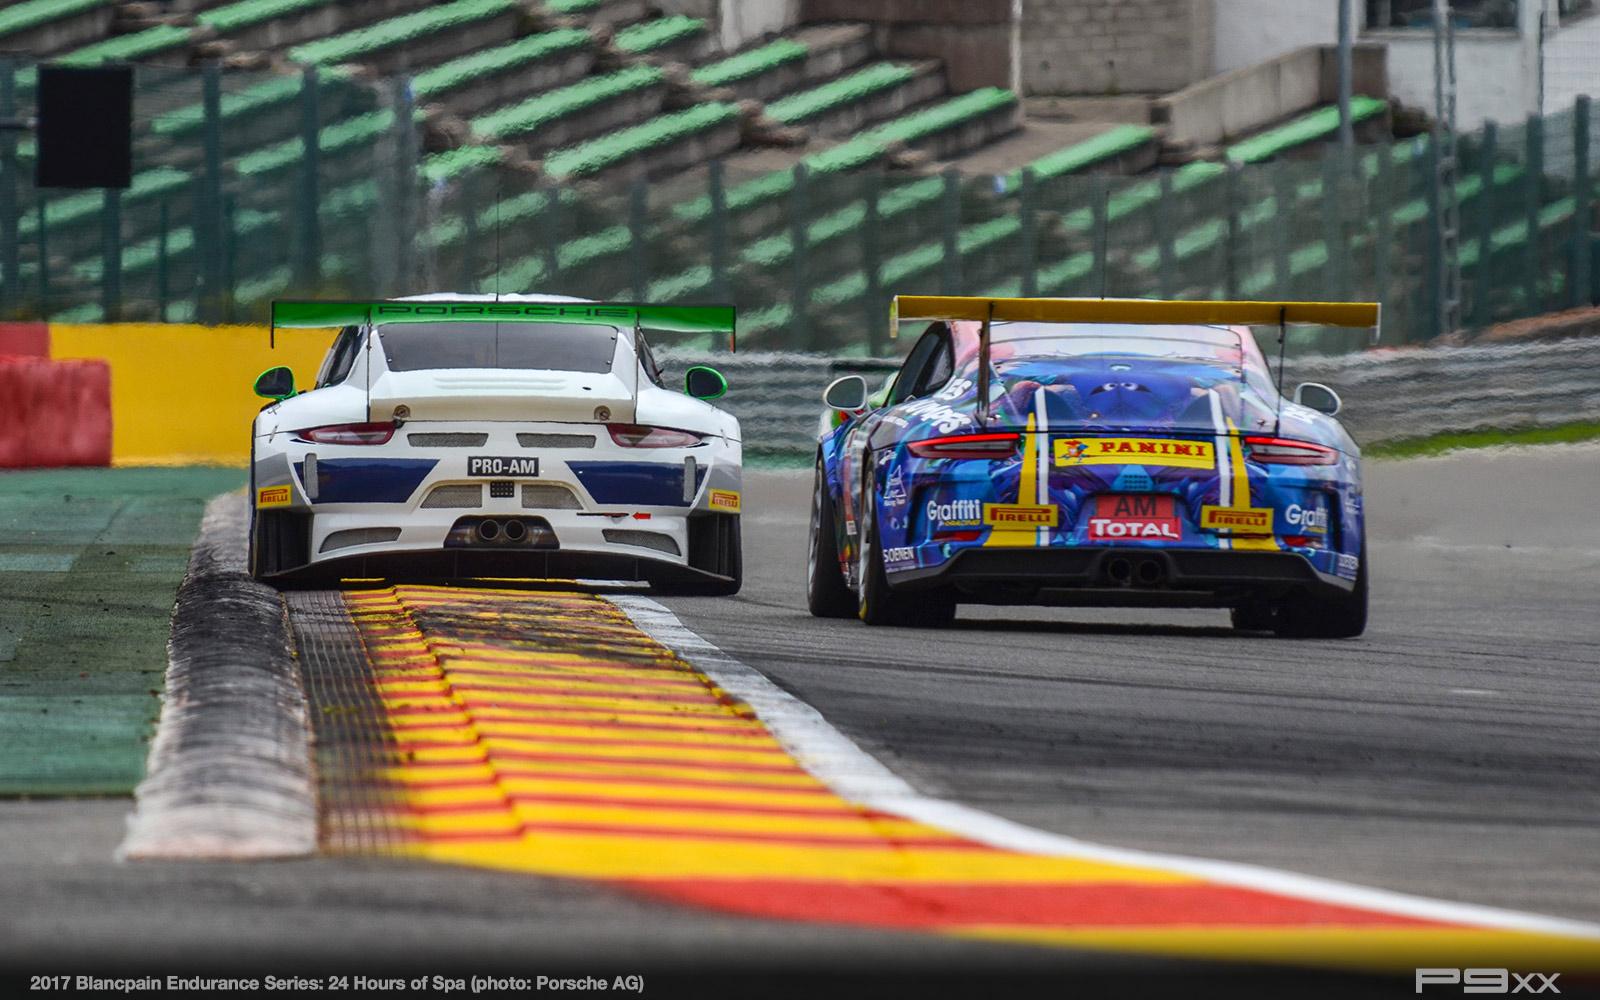 2017-24-Hours-of-Spa-Porsche-308